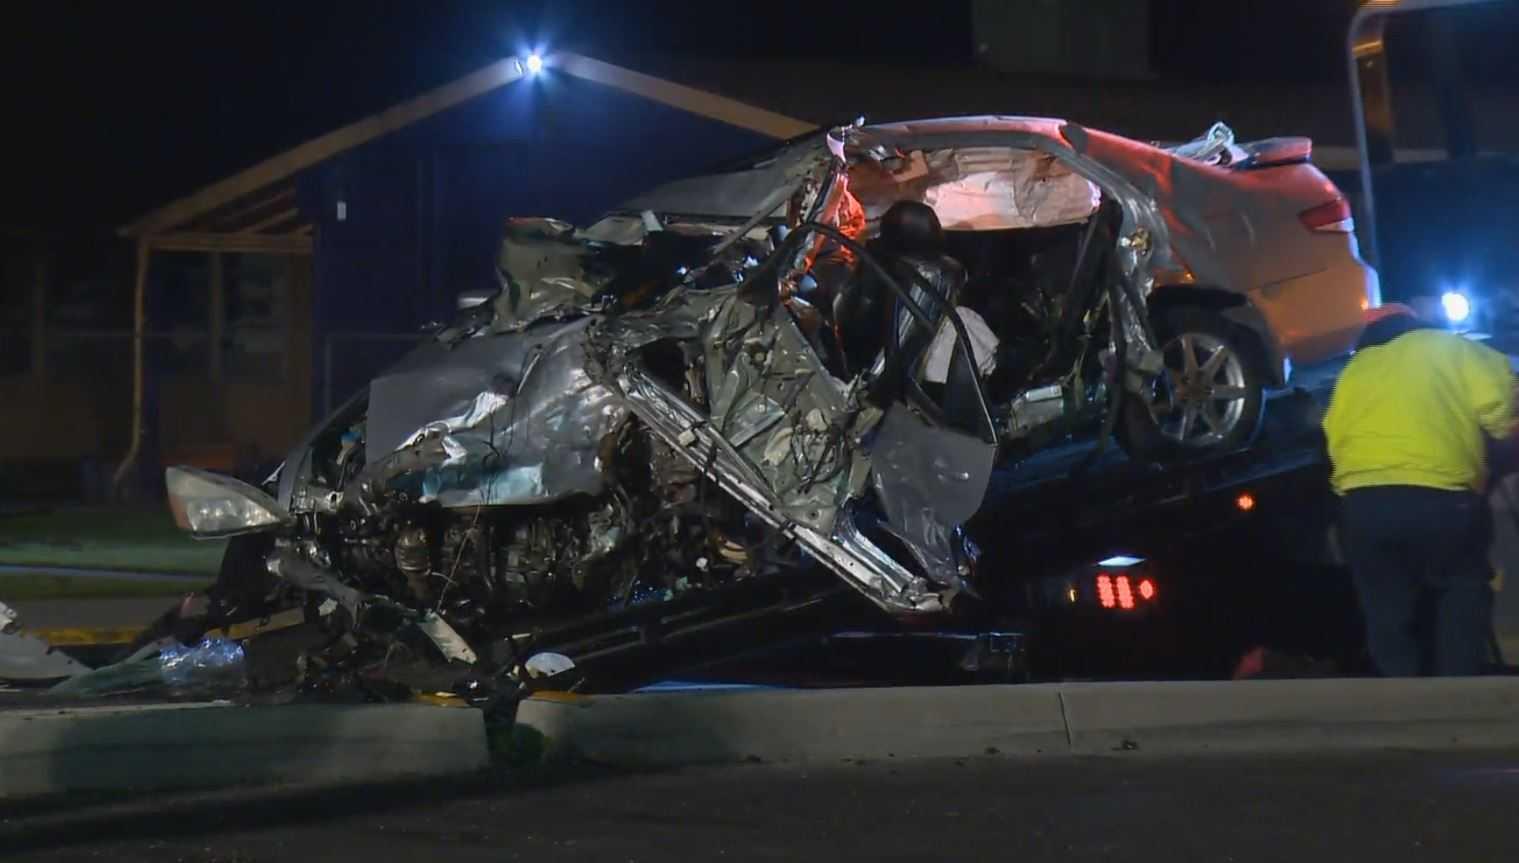 2 drivers killed in head-on crash in Ceres - Modesto news - NewsLocker